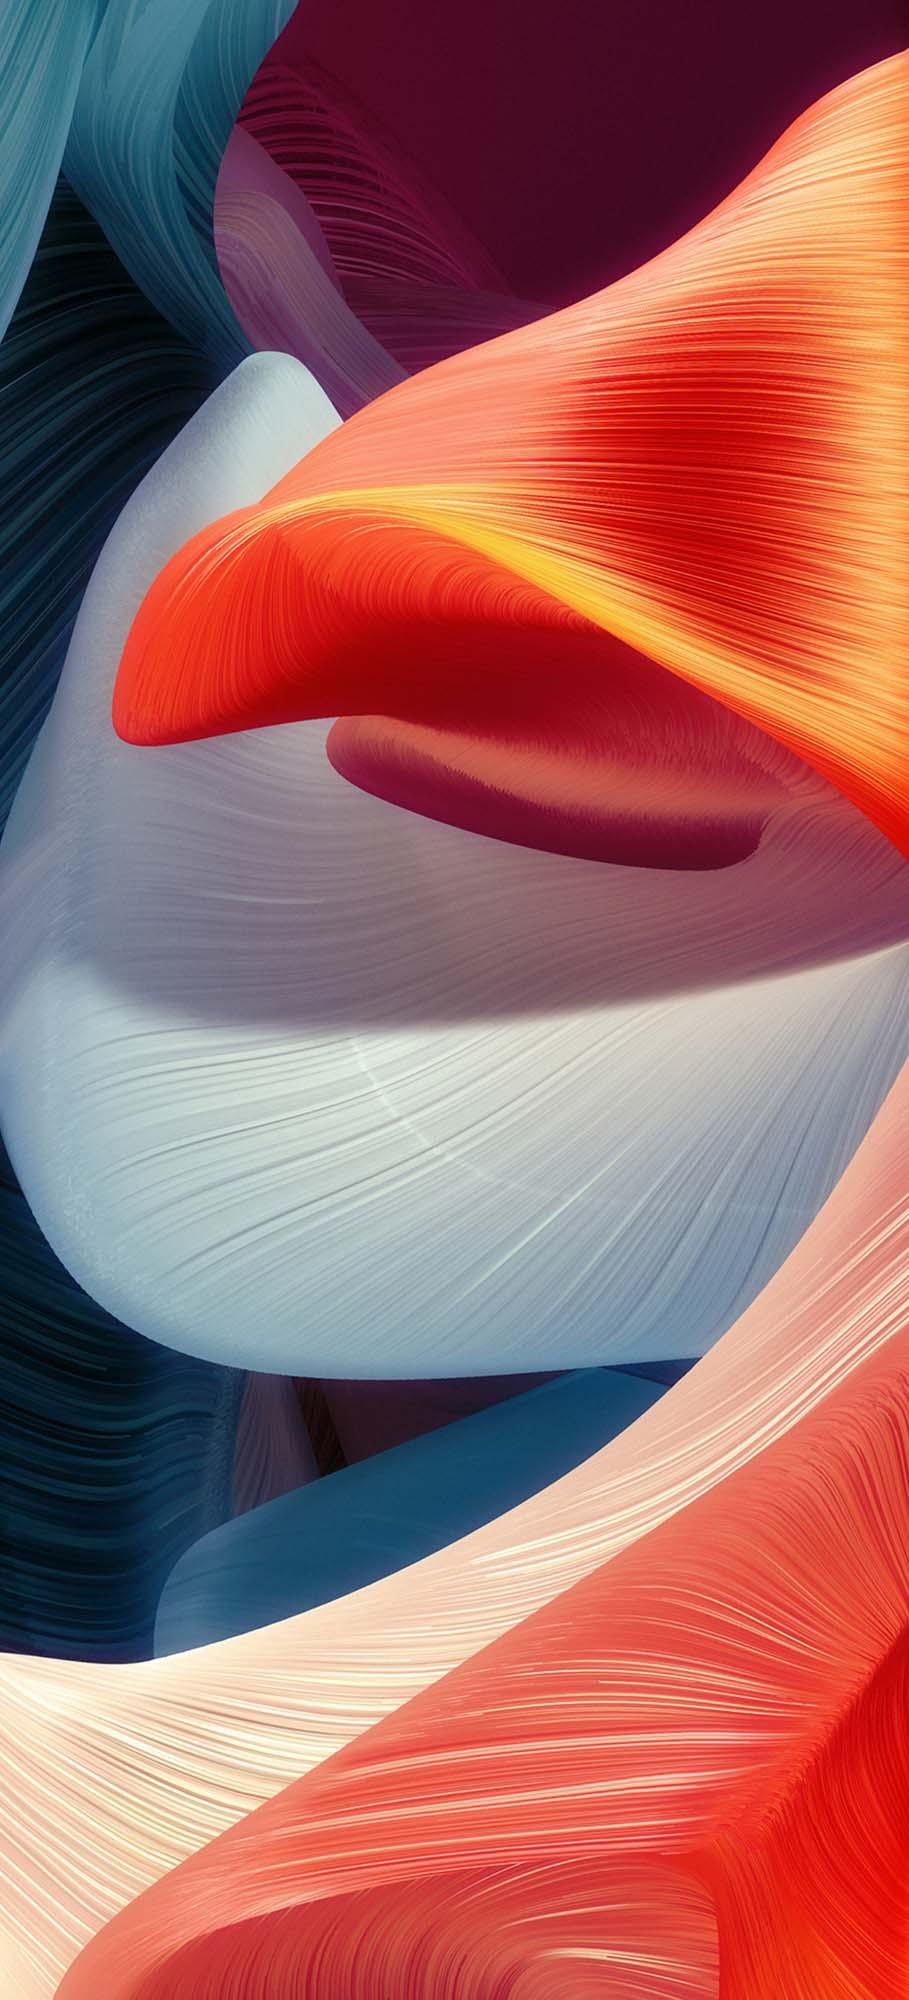 Oppo Art+ Wallpaper (1) TechFoogle